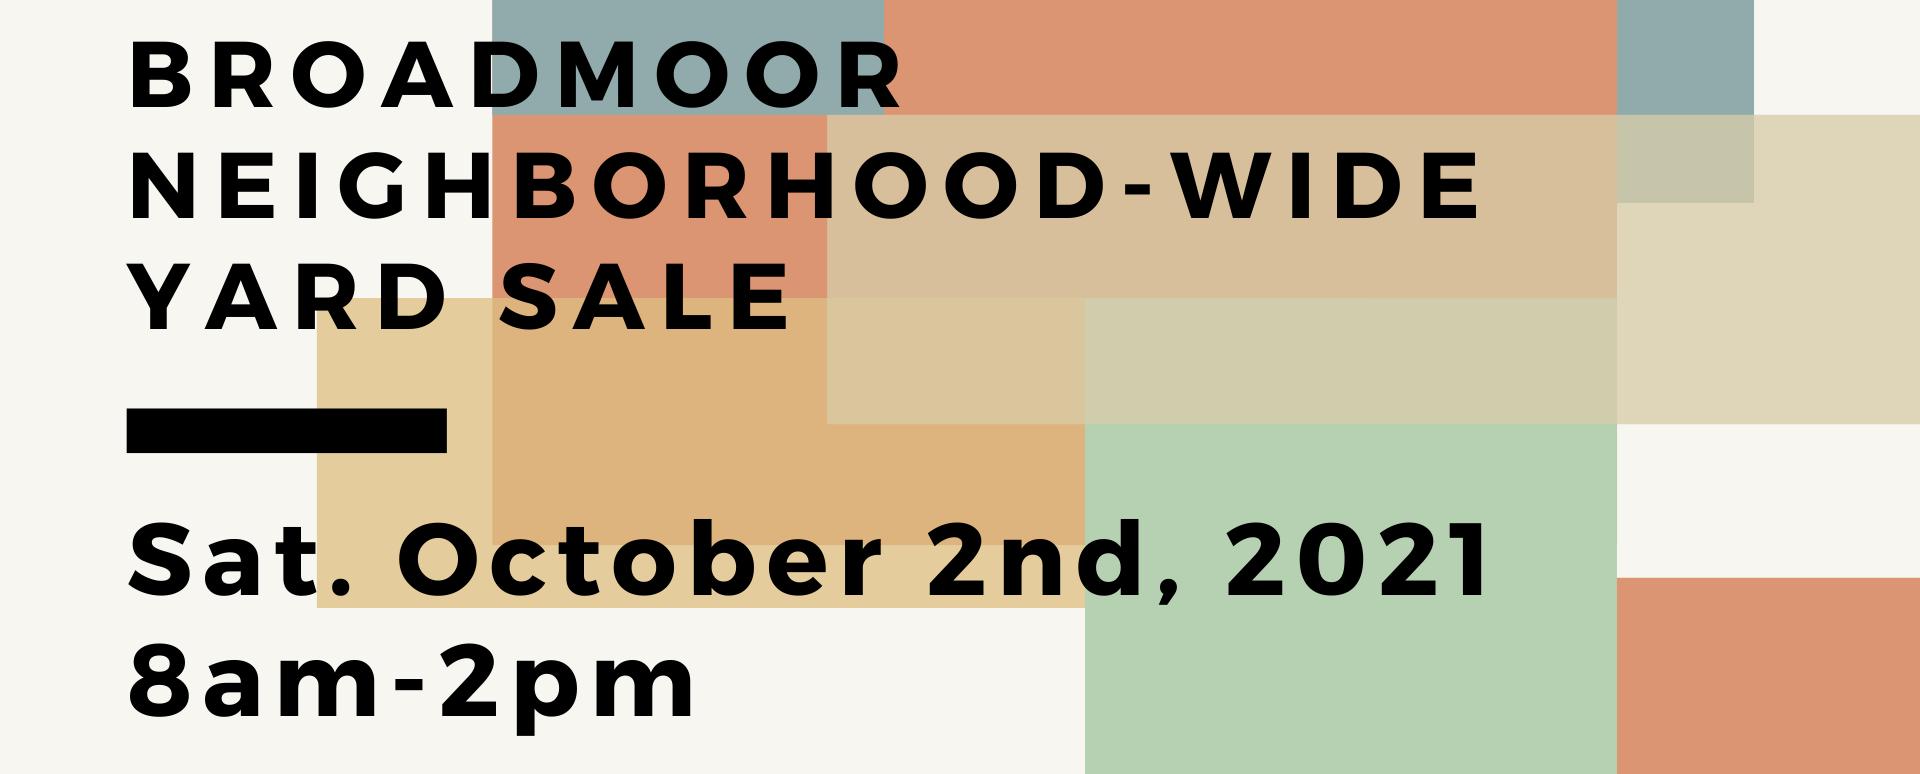 Broadmoor Neighborhood-Wide Yard Sale Saturday October 2nd 2021 8am-2pm